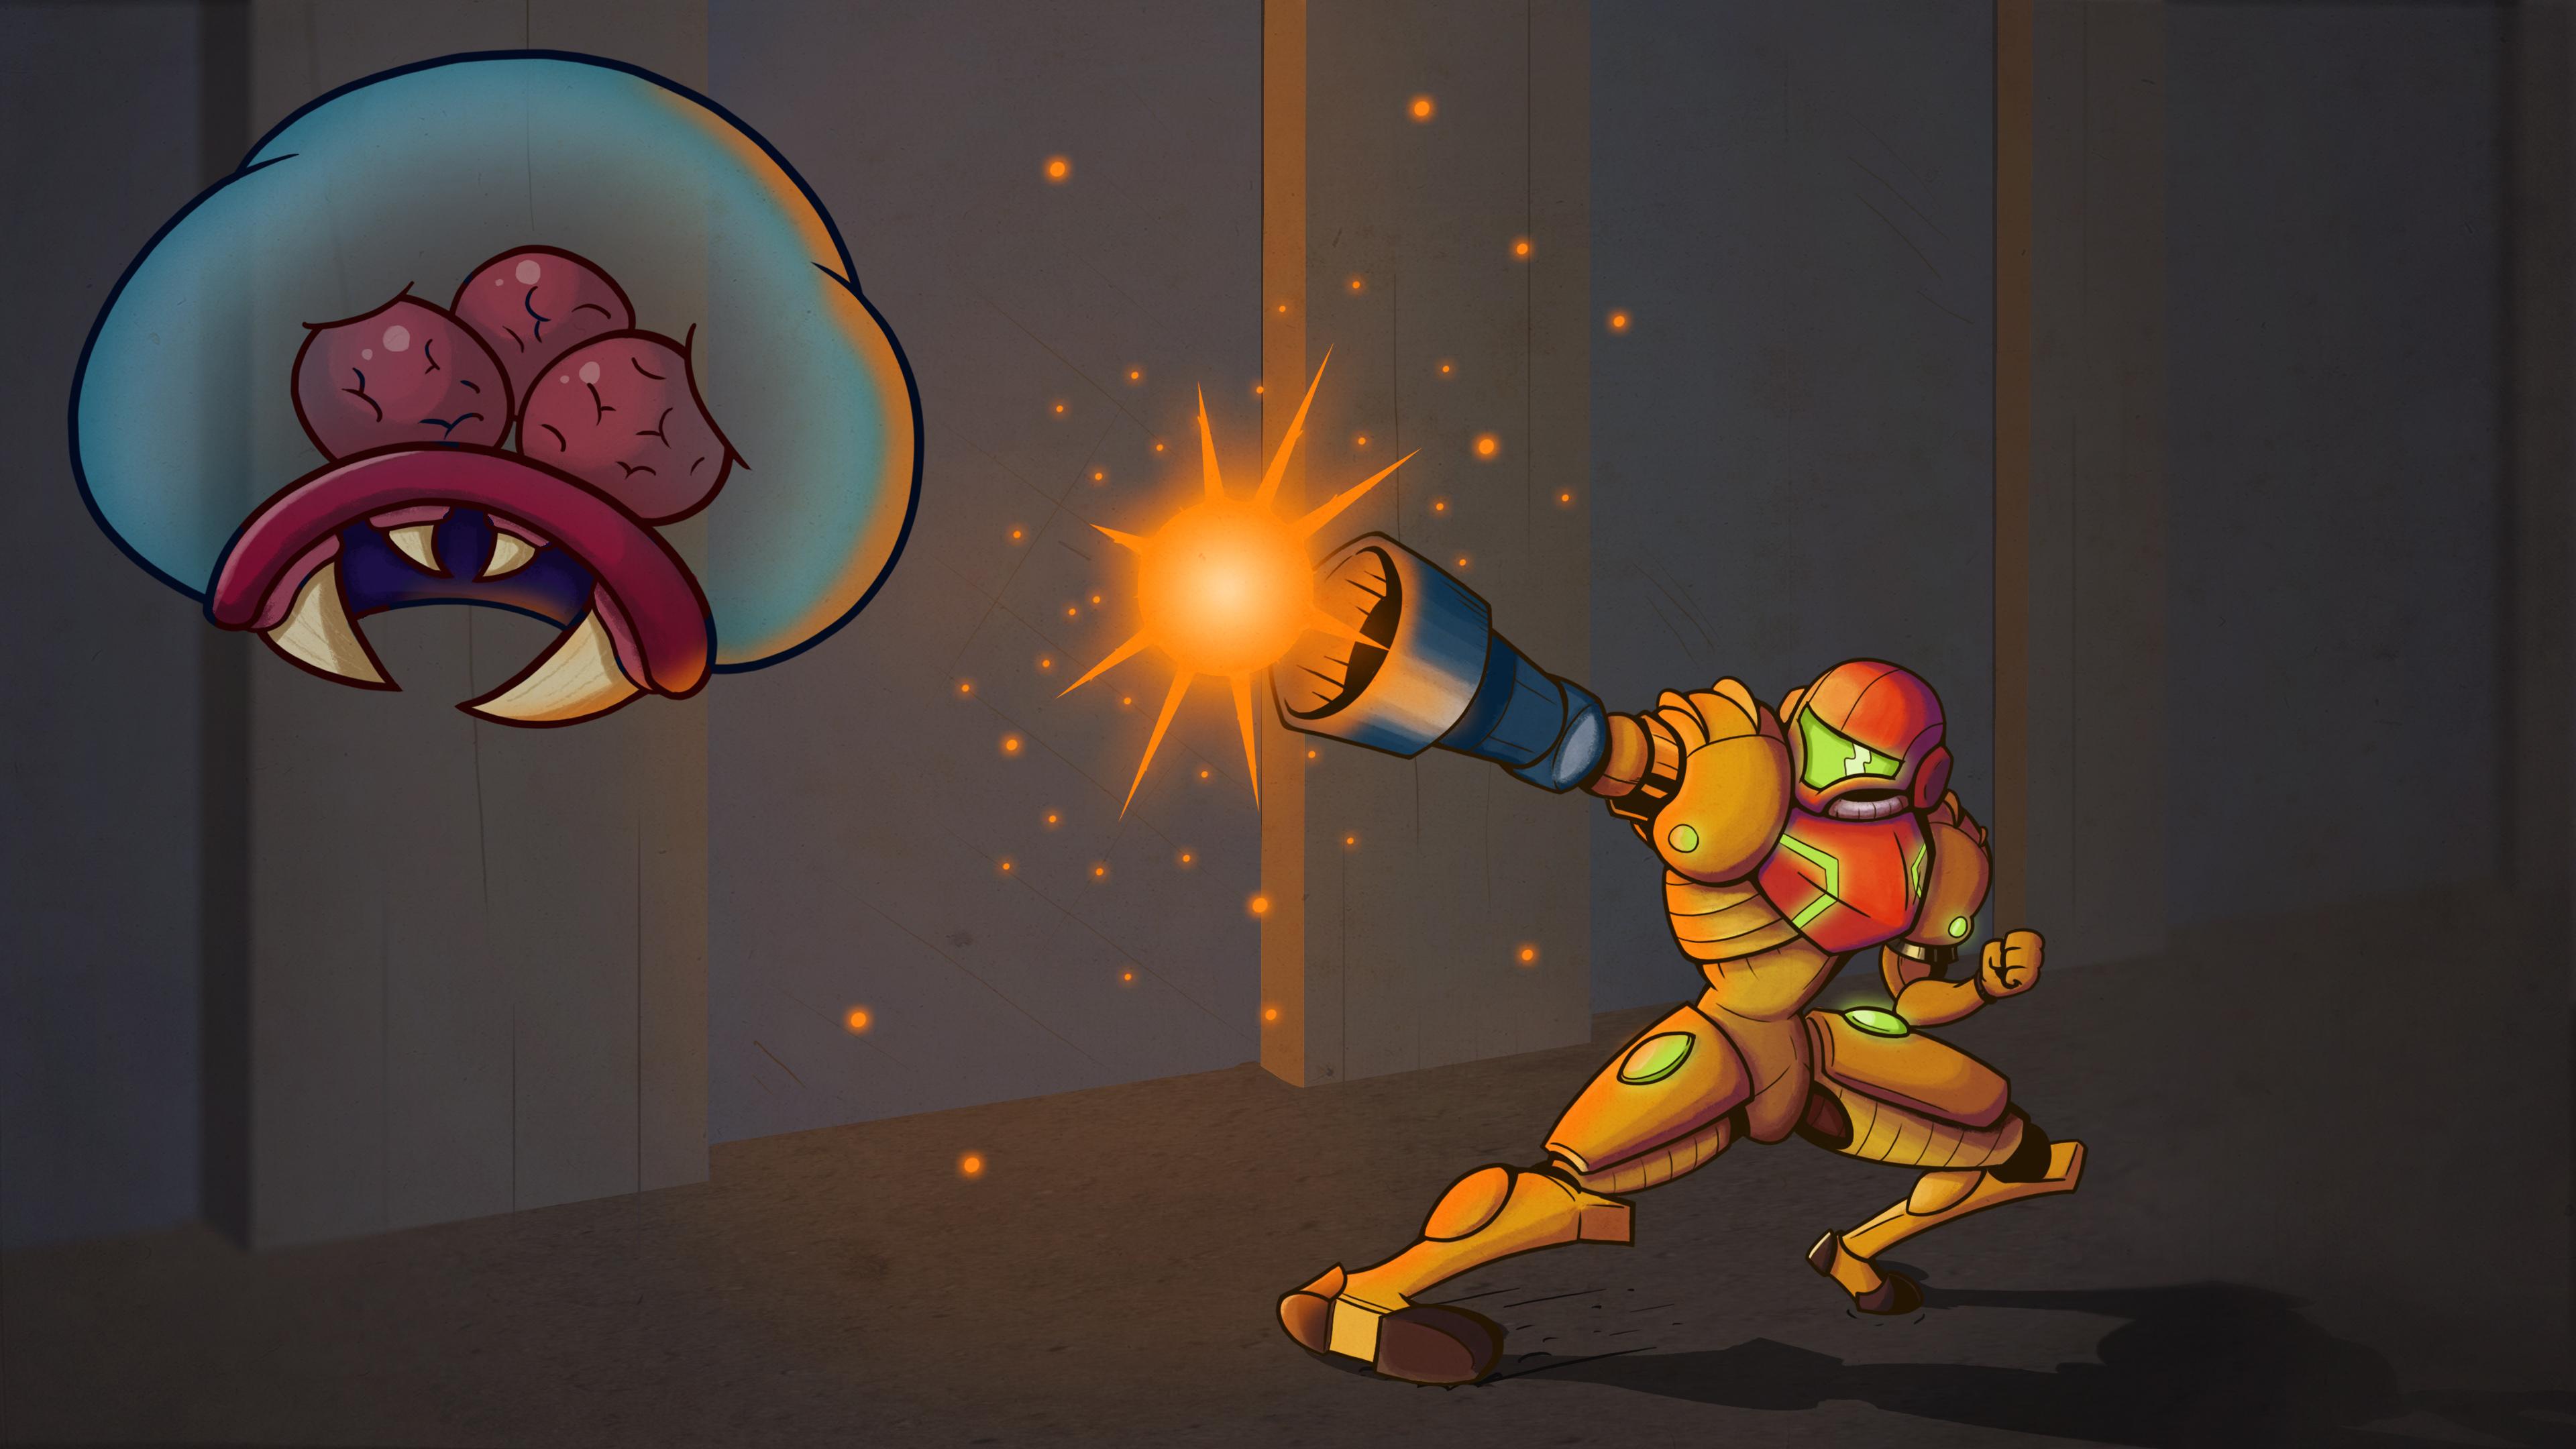 Samus vs Metroid